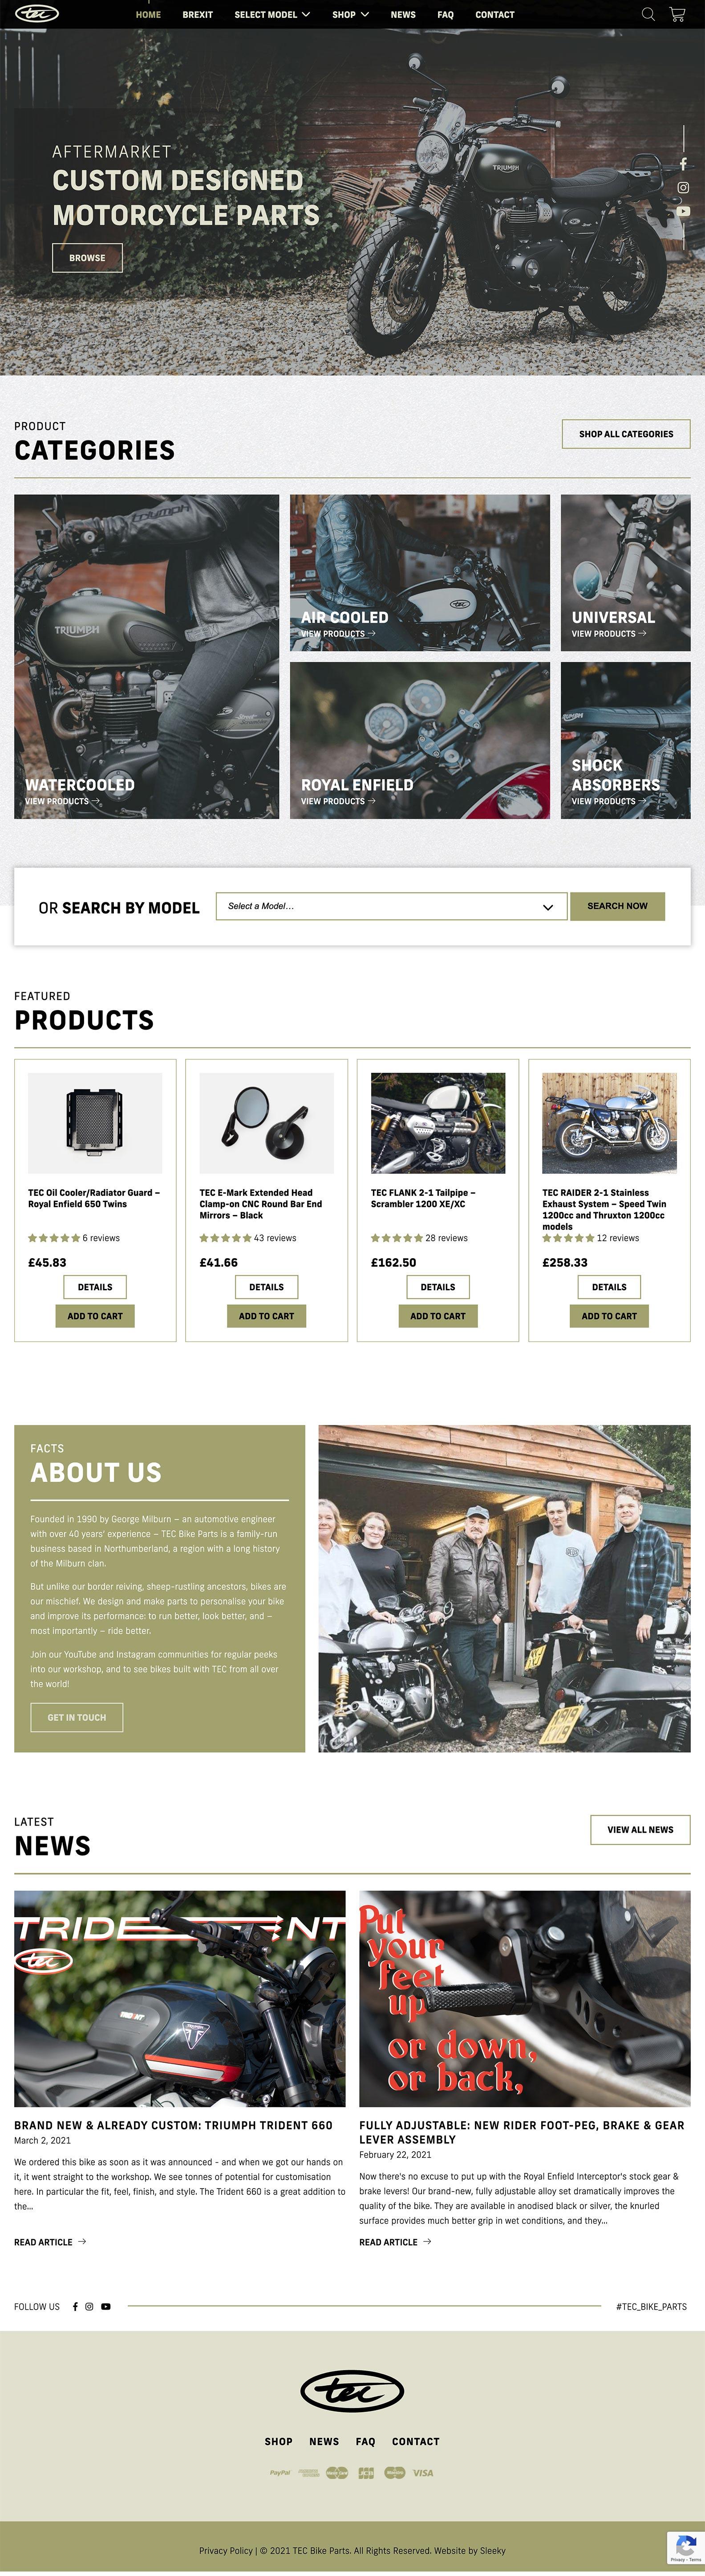 Desktop view of bike tech company's website